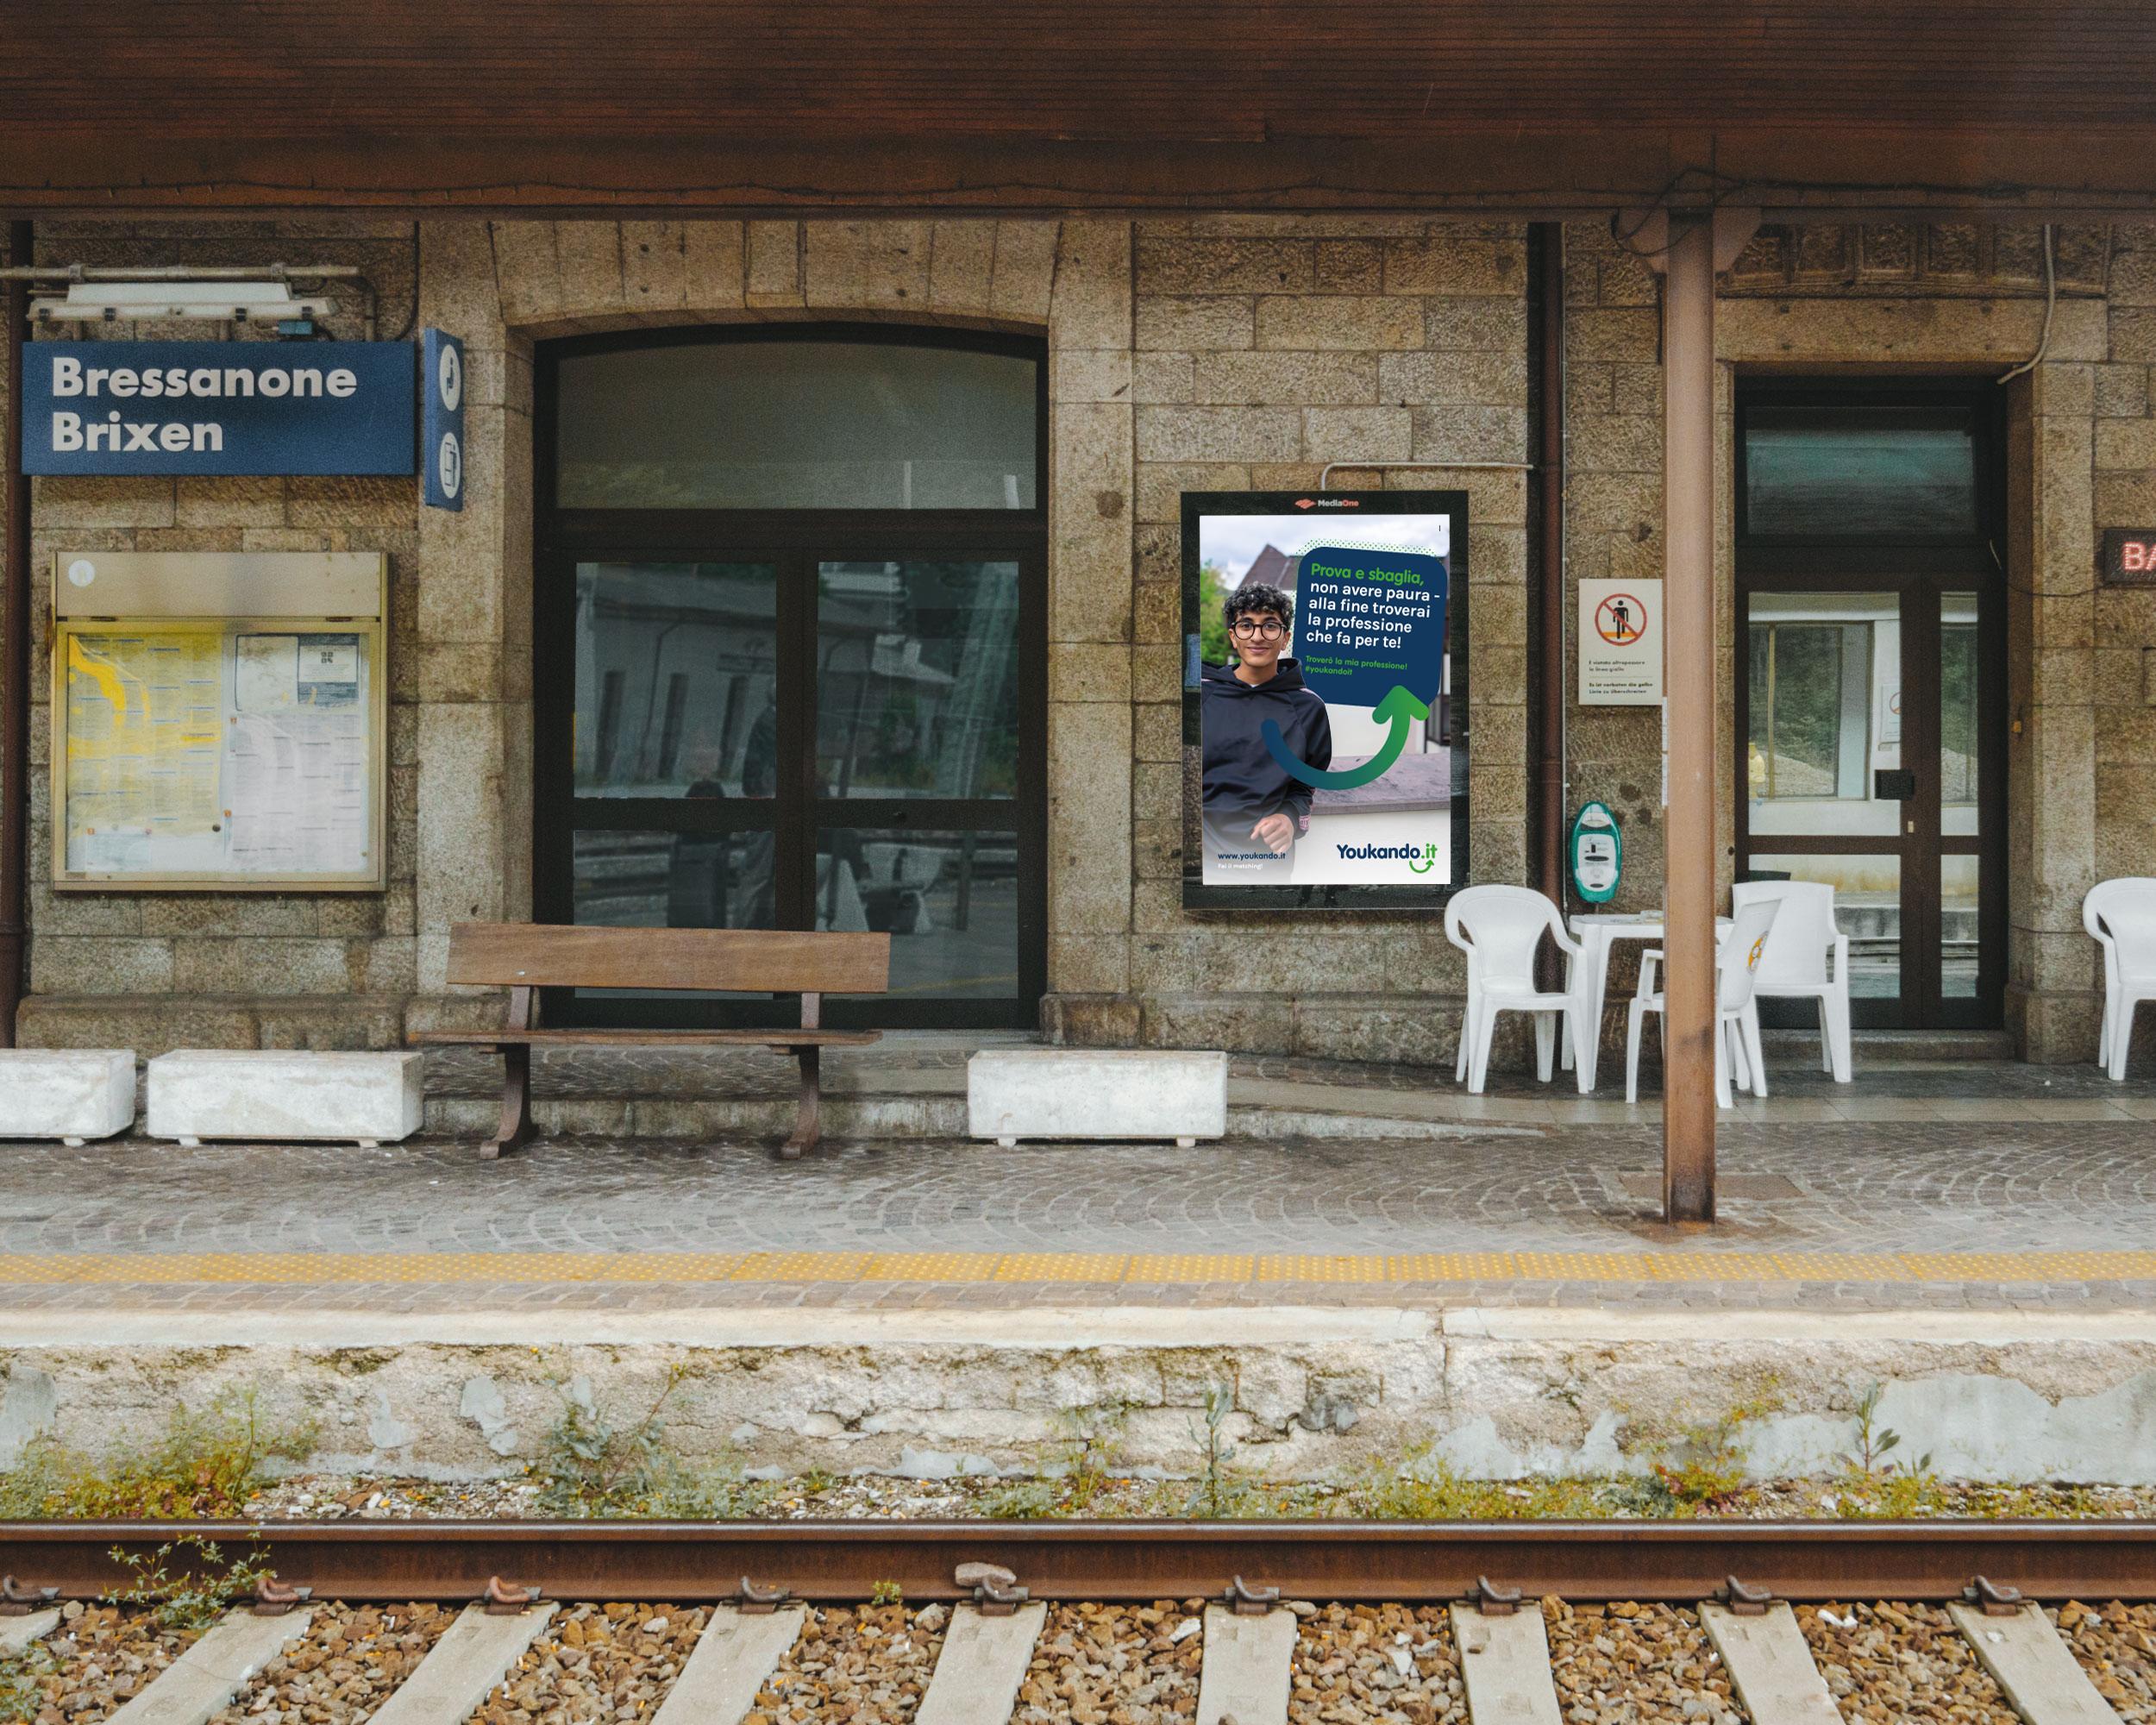 YKD_Bahnhof-BX-Scroller